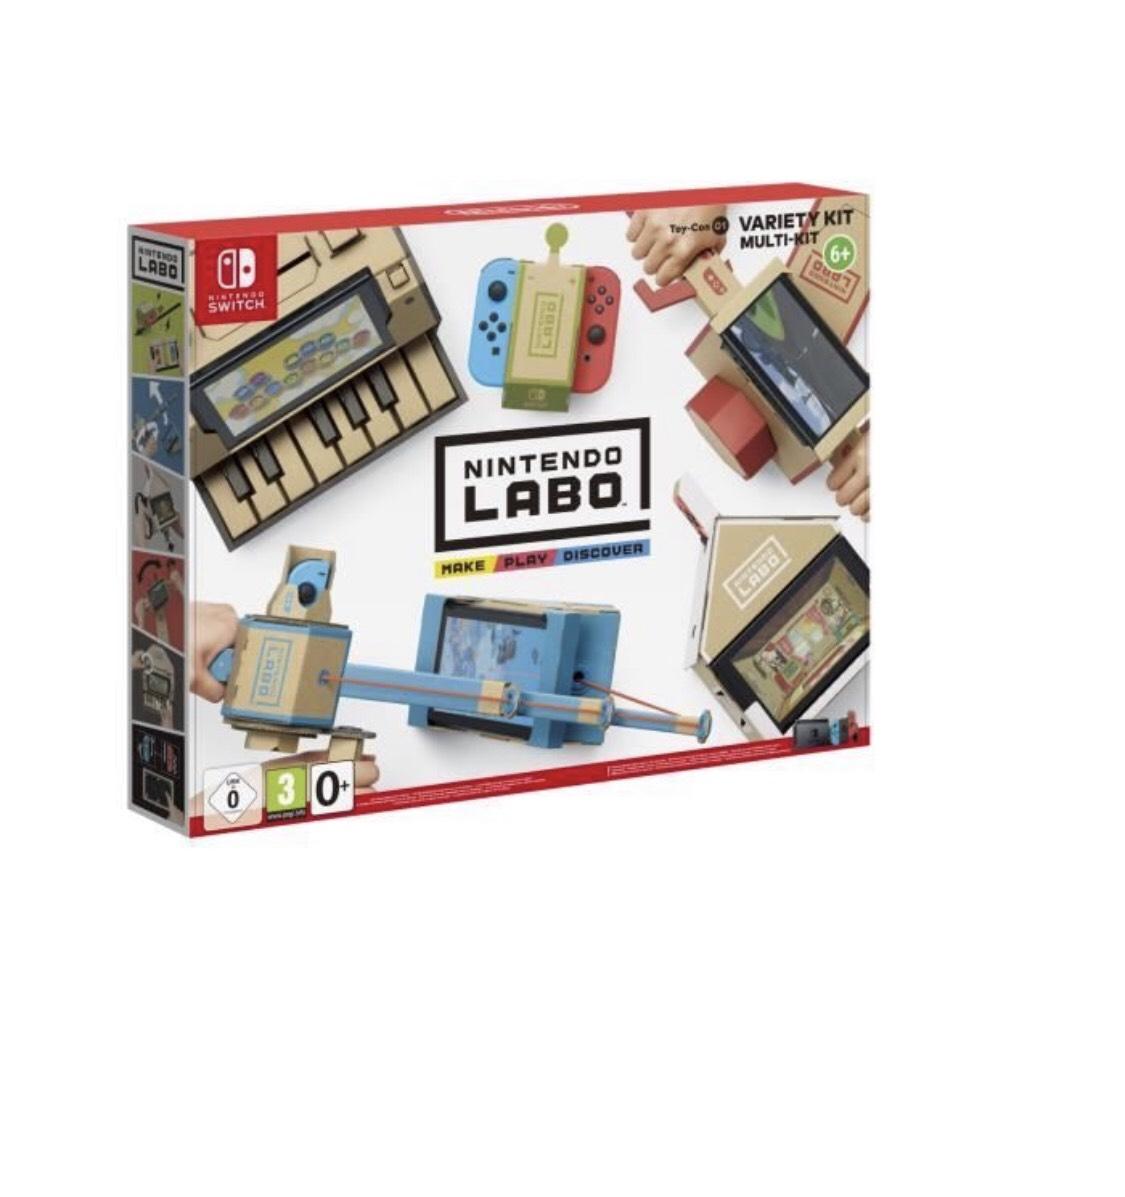 Nintendo Labo Multi-Kit sur Nintendo Switch